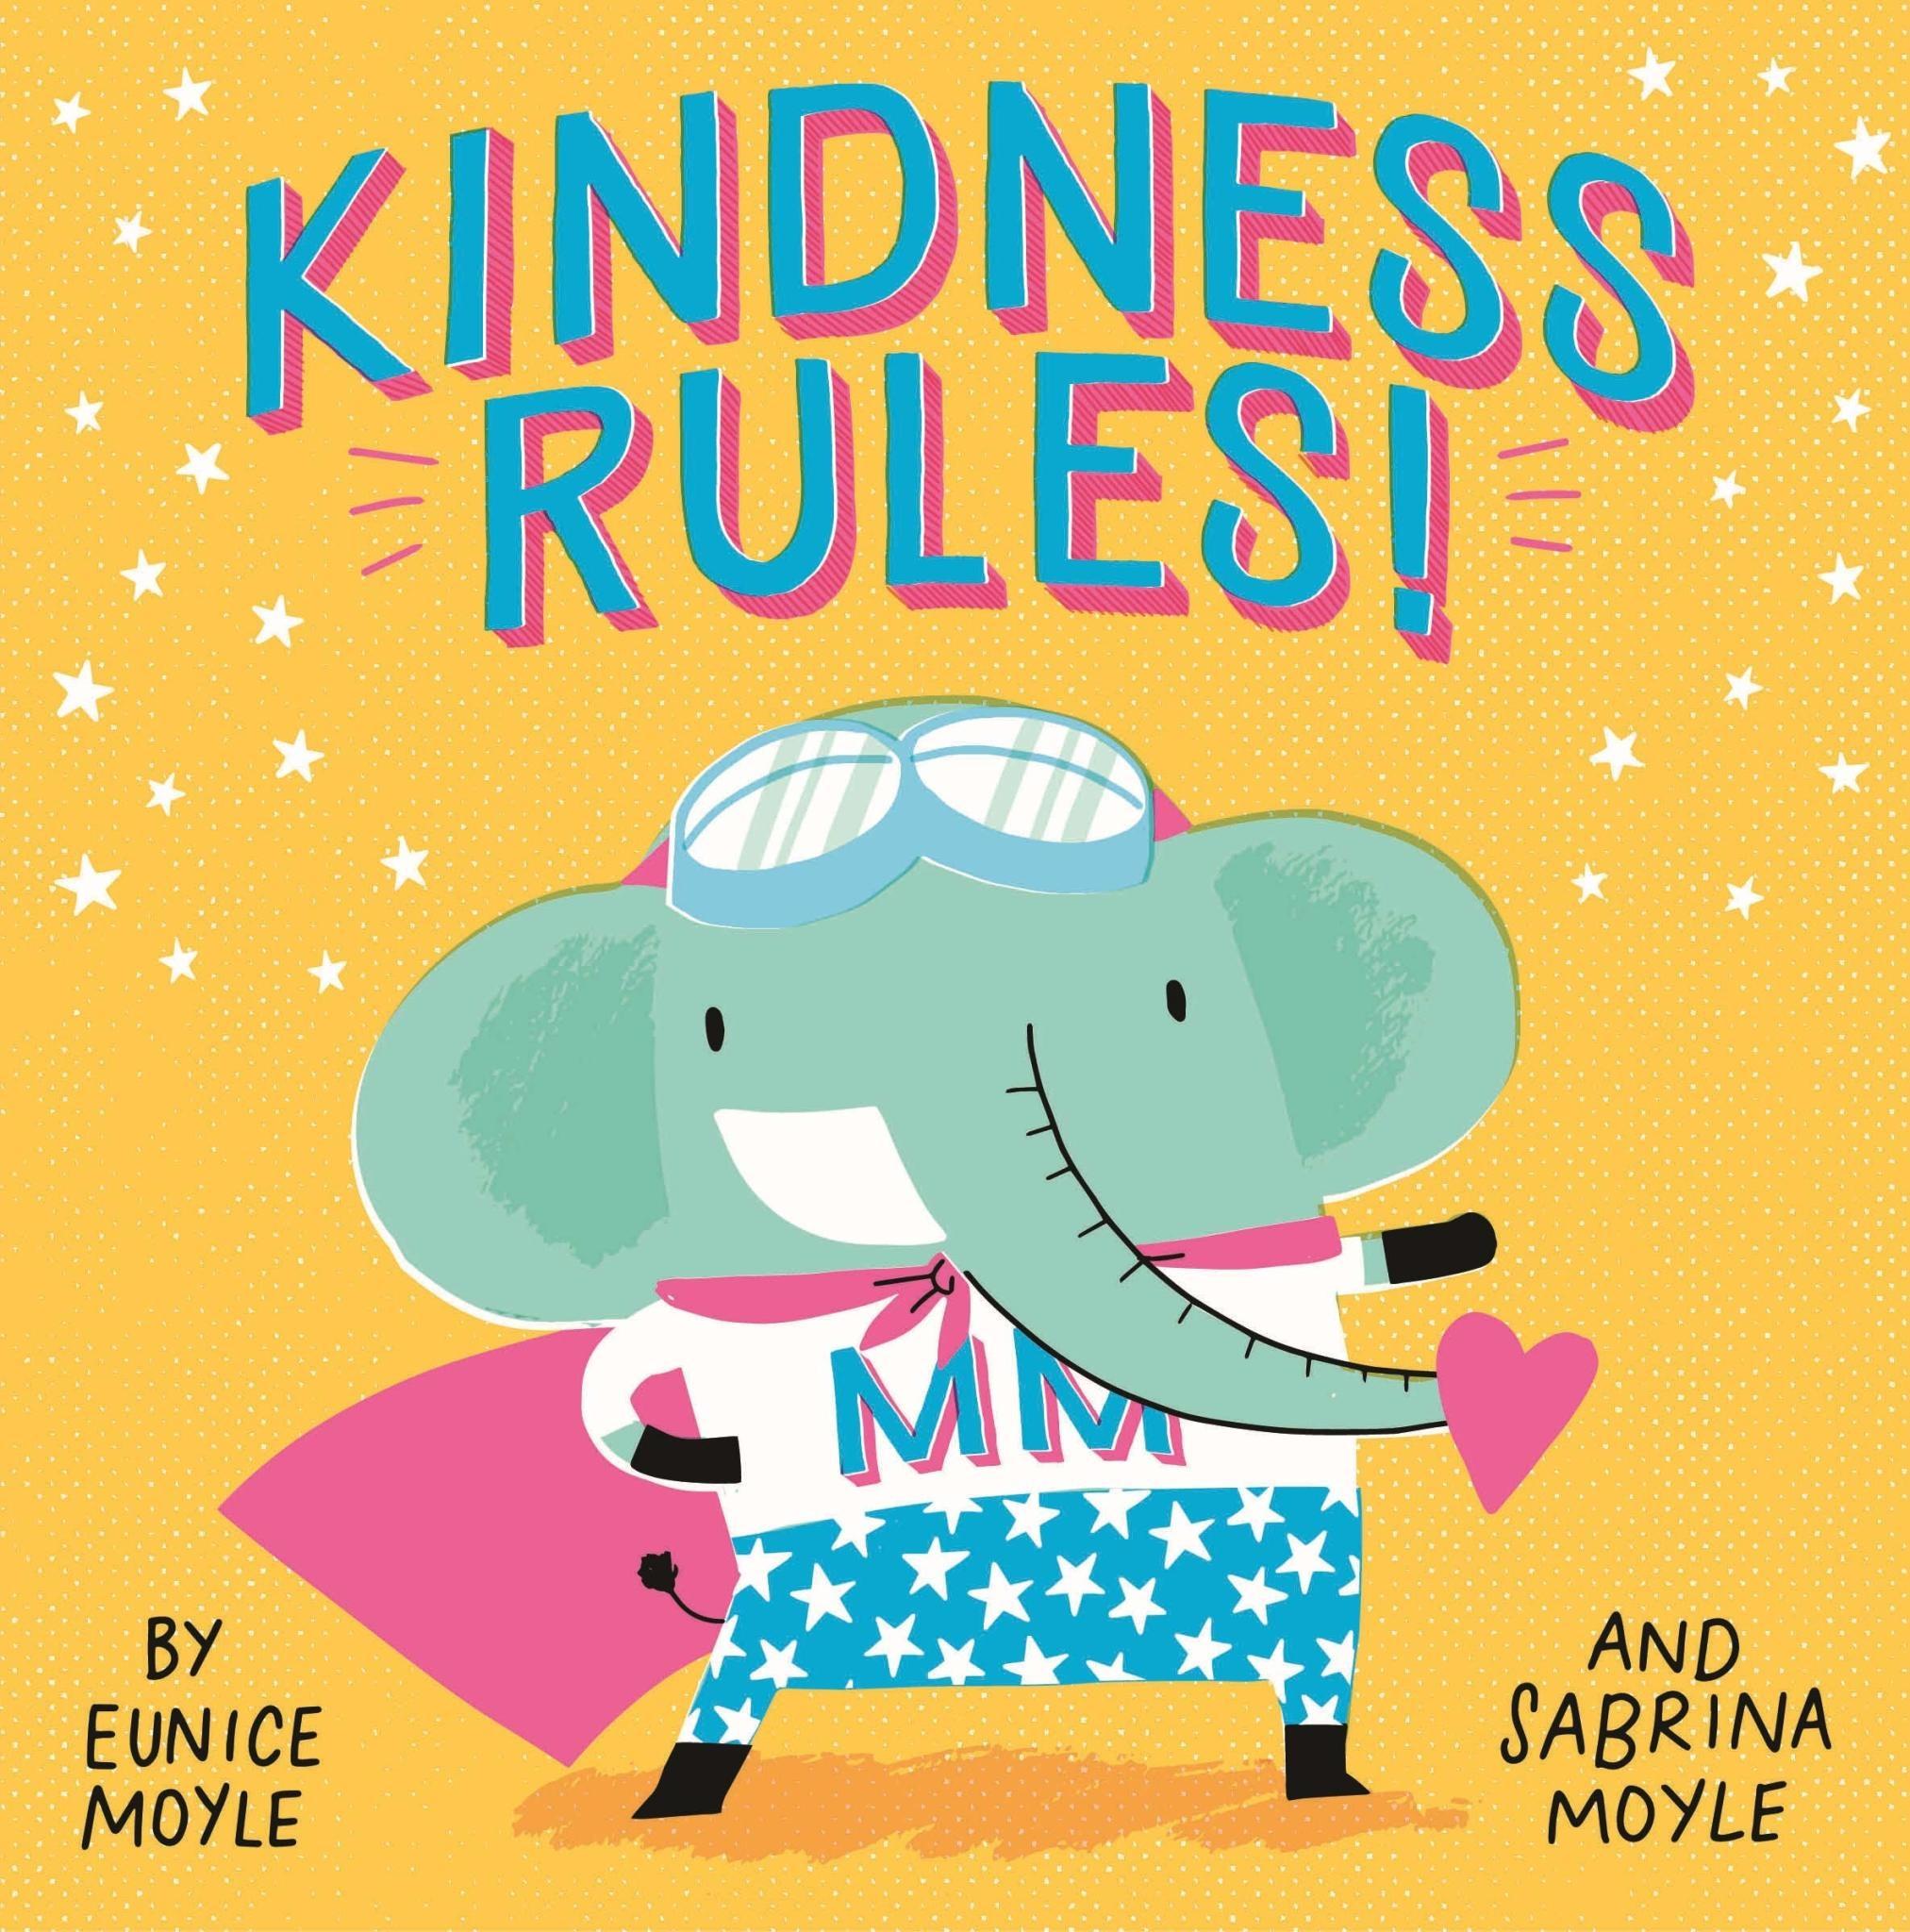 Abrams-Stewart Tabori & Chang Kindess Rules!